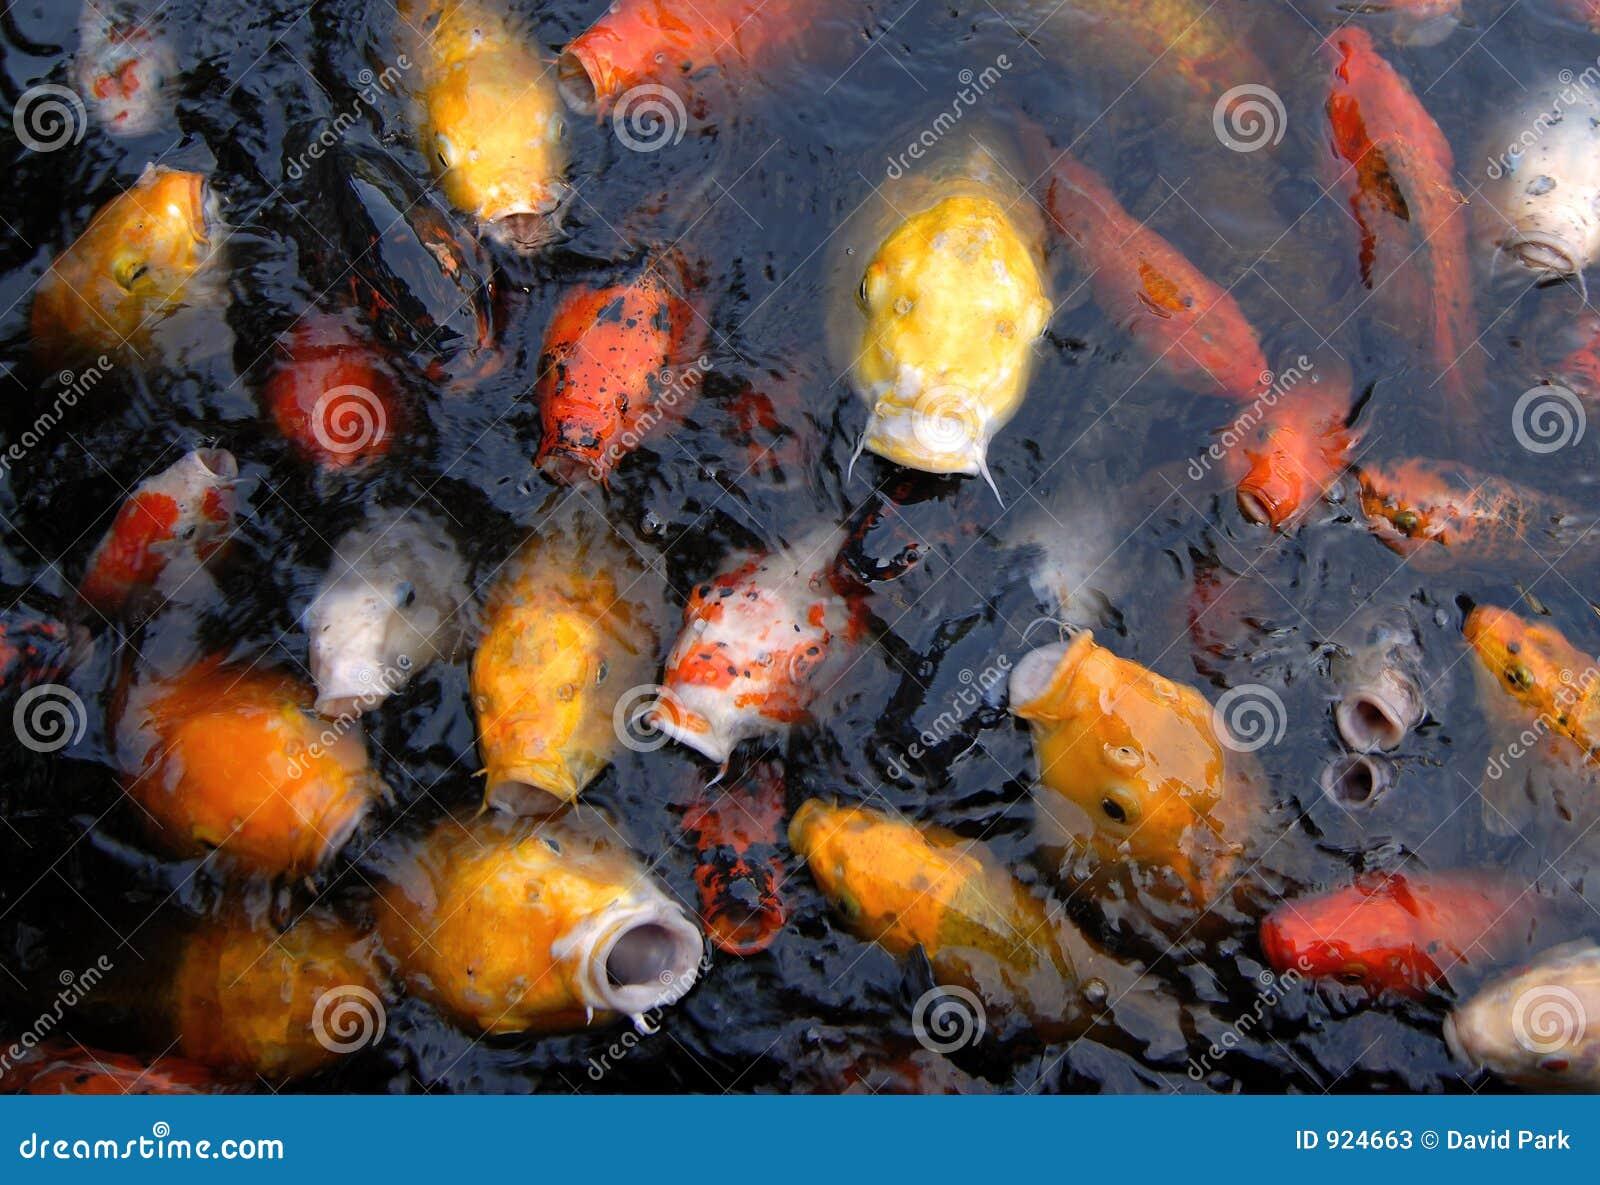 Fish feeding frenzy stock photos image 924663 for Feeding frenzy fish